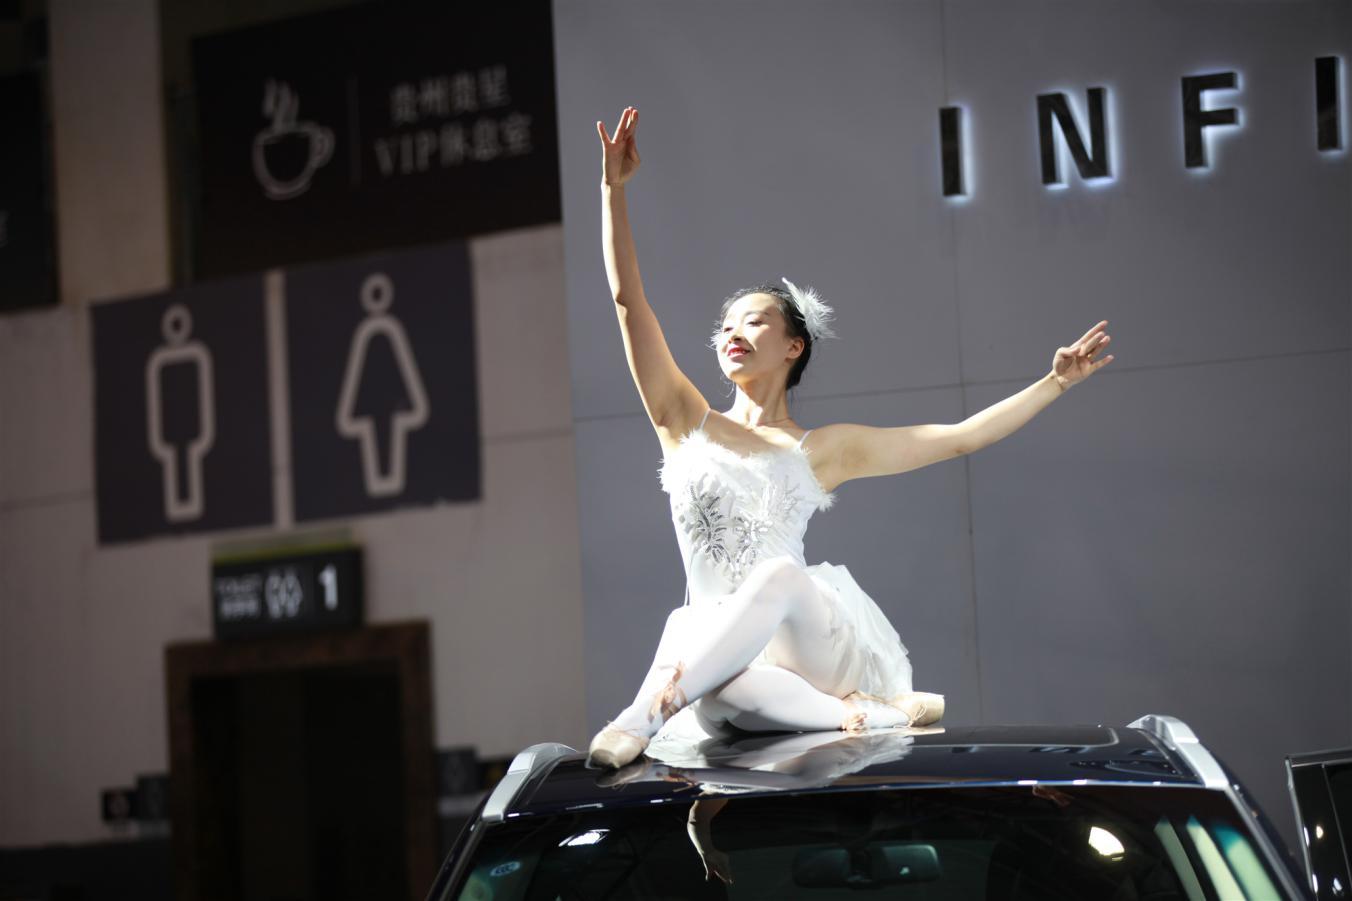 E:\2019年张丽\2019贵阳汽车文化节\稿件类\启动稿\最终稿\3.jpg3